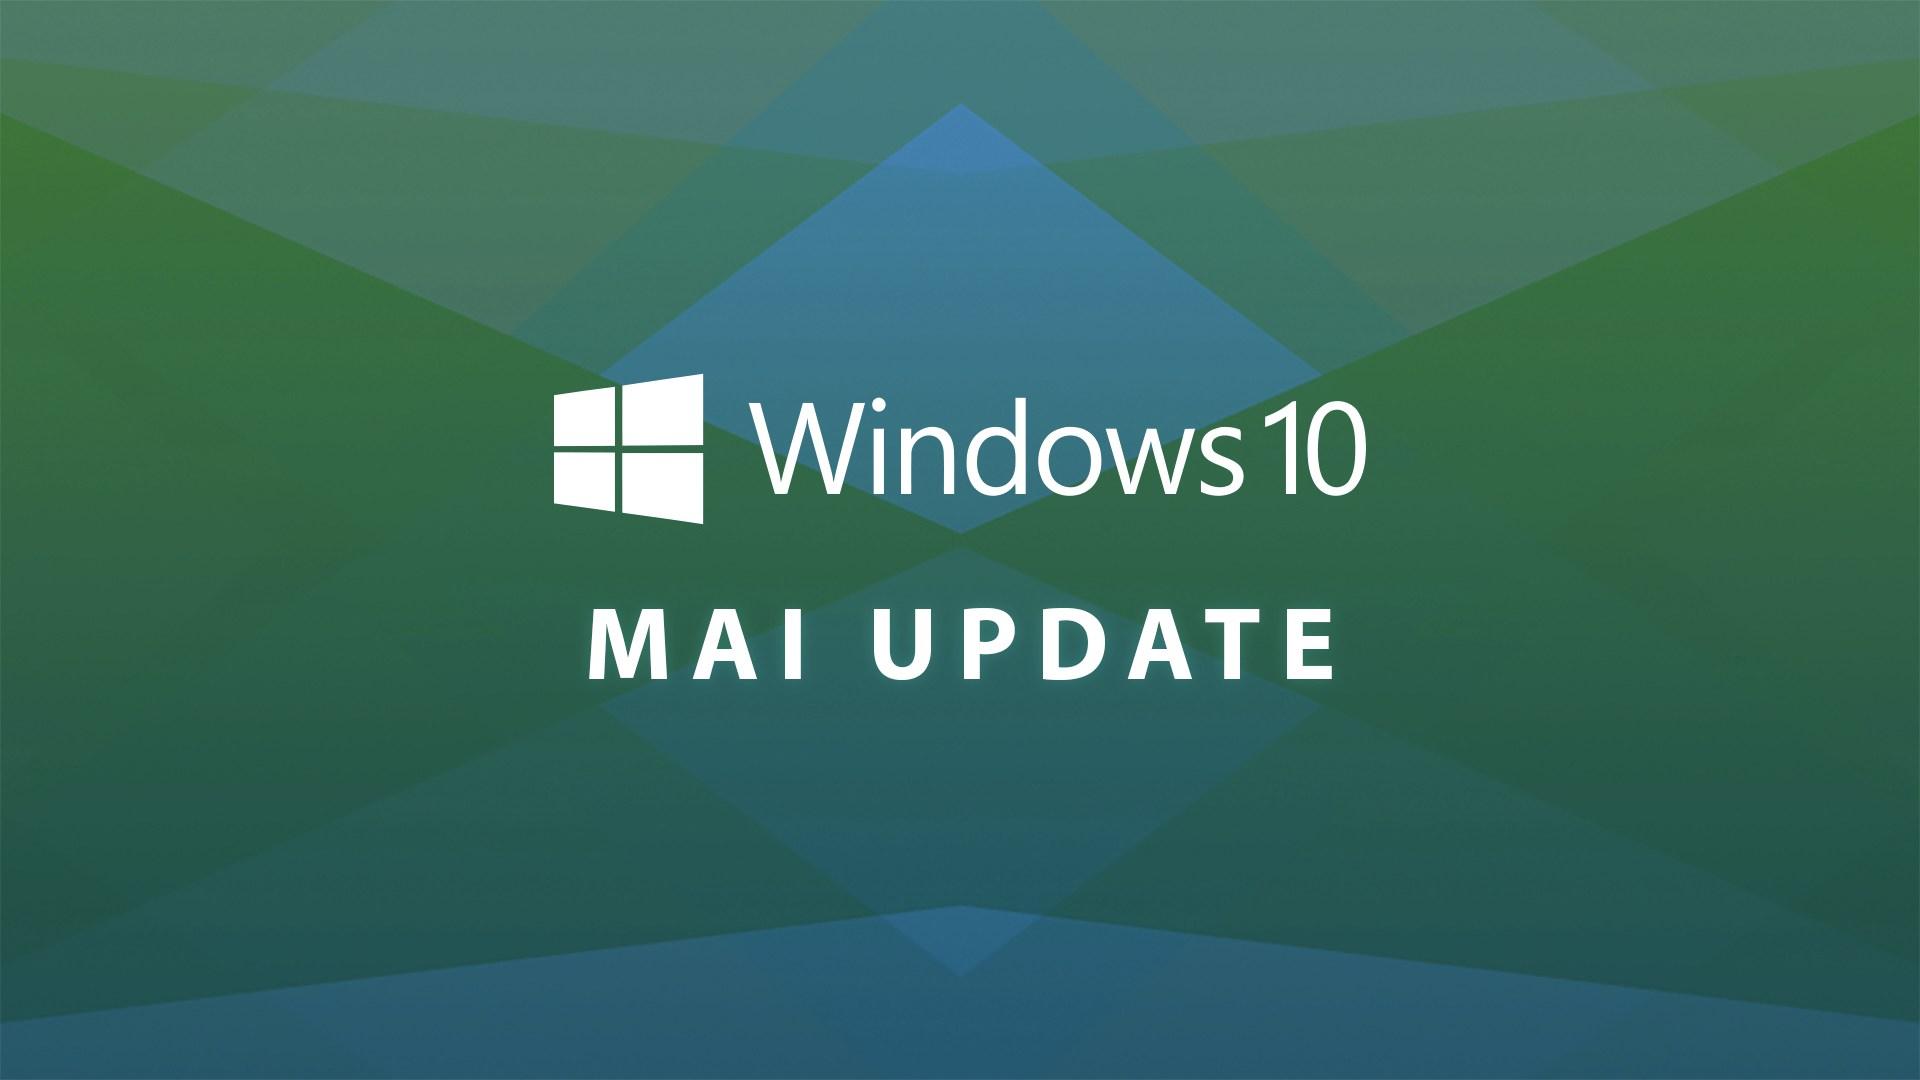 Windows 10, Windows 10 Mai Update, Windows 10 Version 2004, Windows 10 20H1, Version 2004, 739774